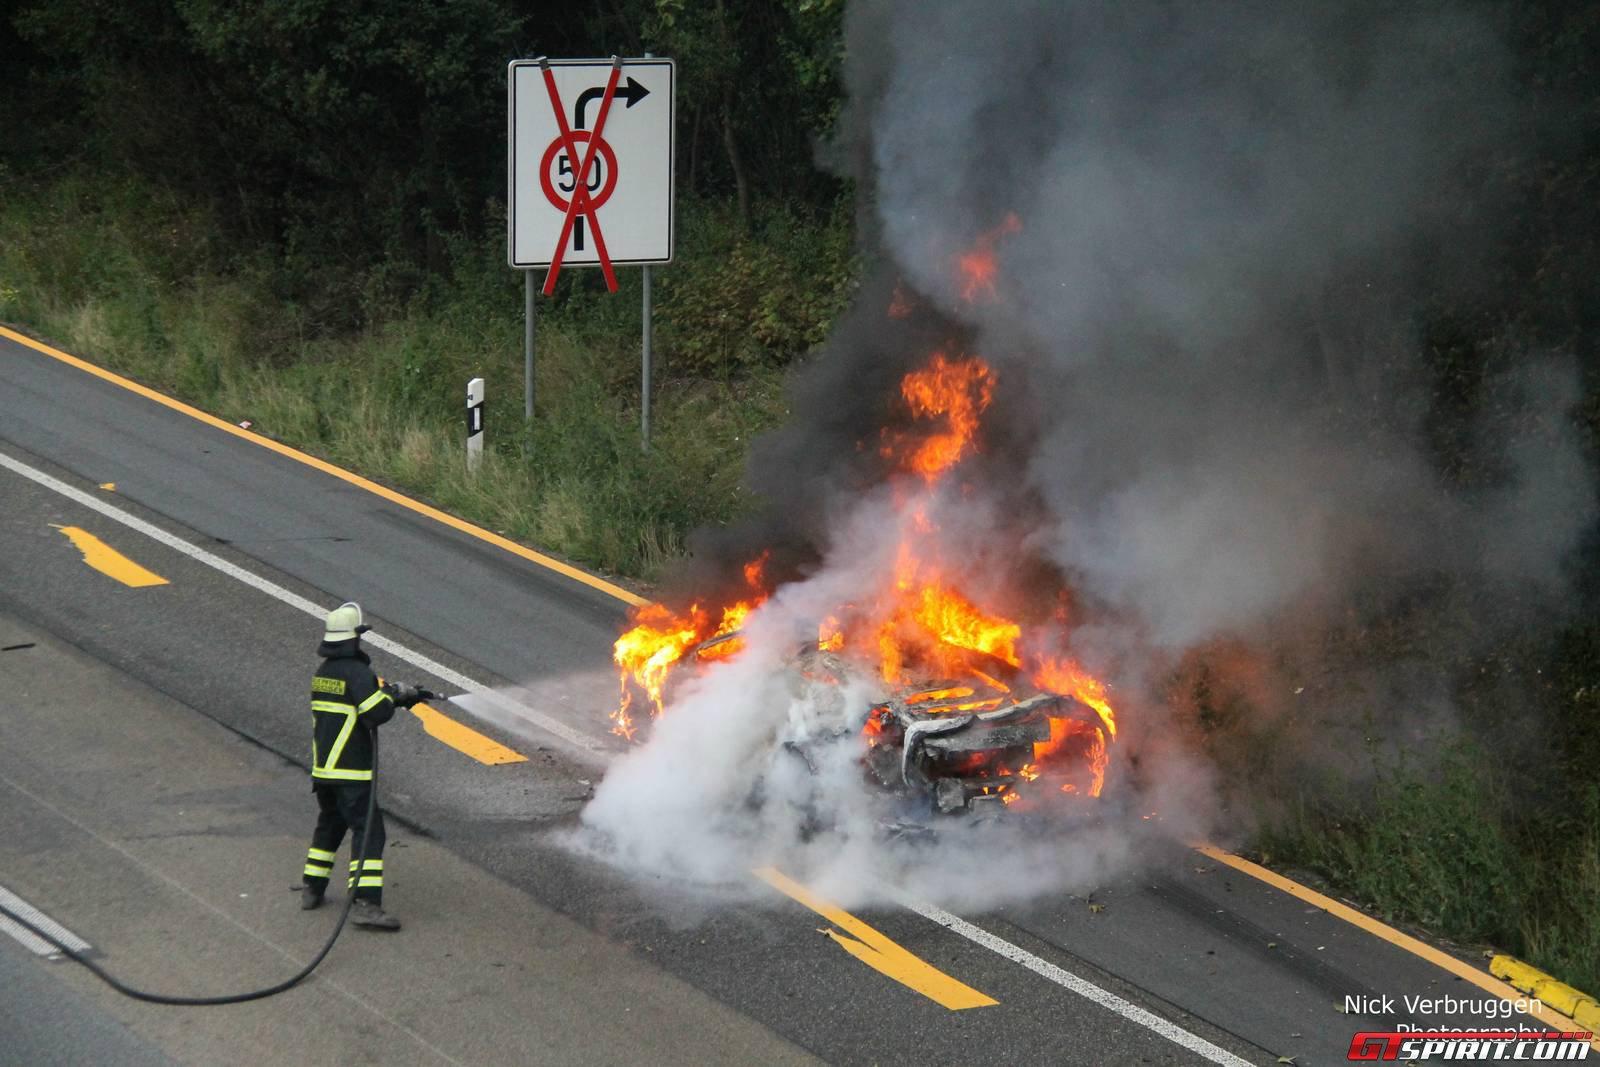 Lamborghini Murcielago Reduced To Ashes In Less Than 15 Minutes